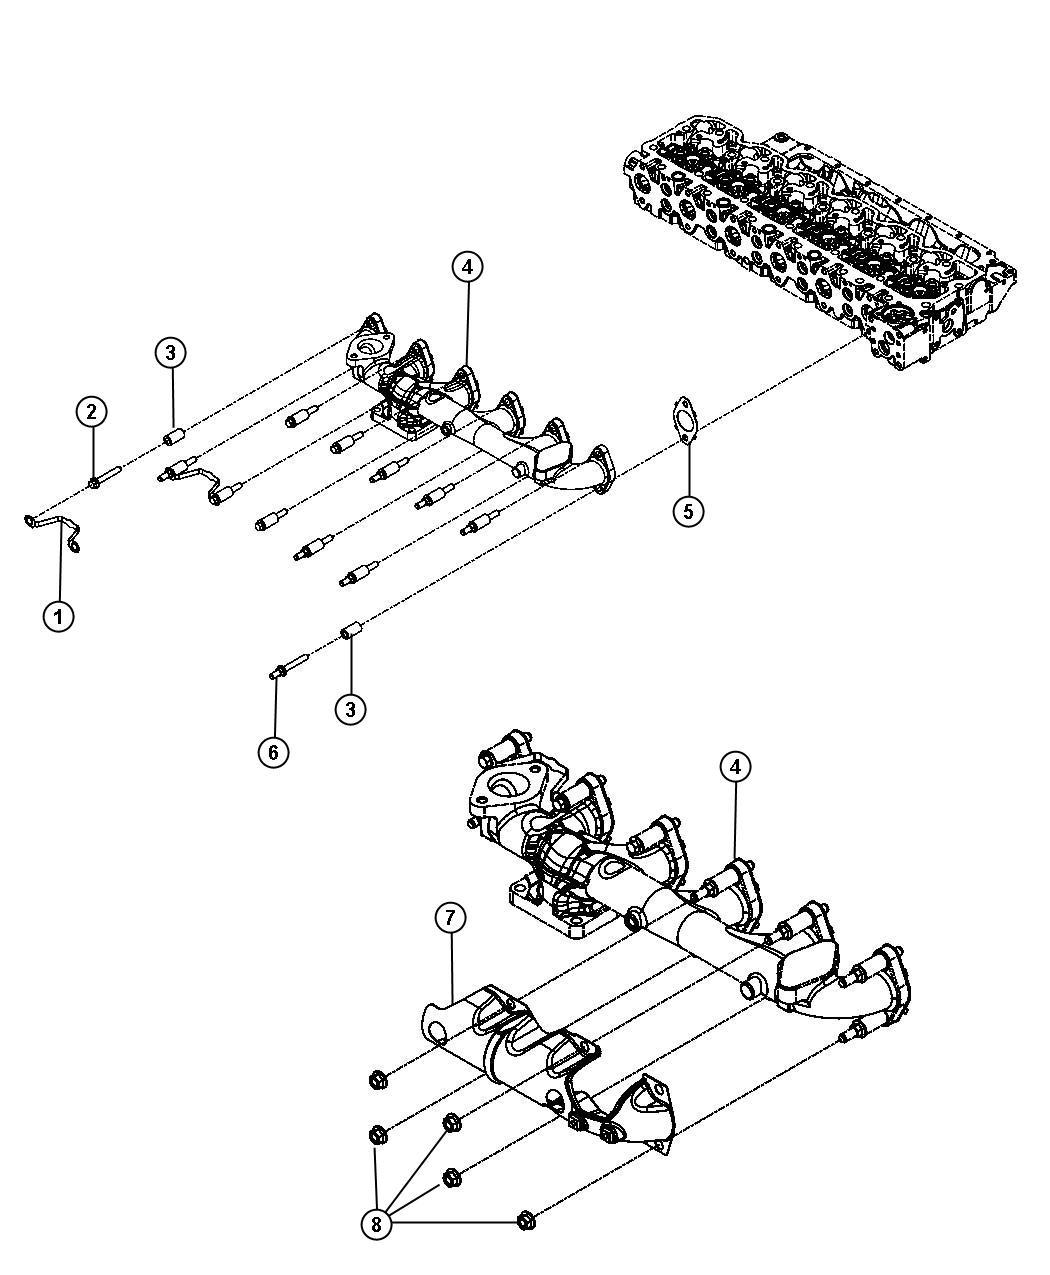 Dodge Ram Manifold Exhaust 50 State Emissions